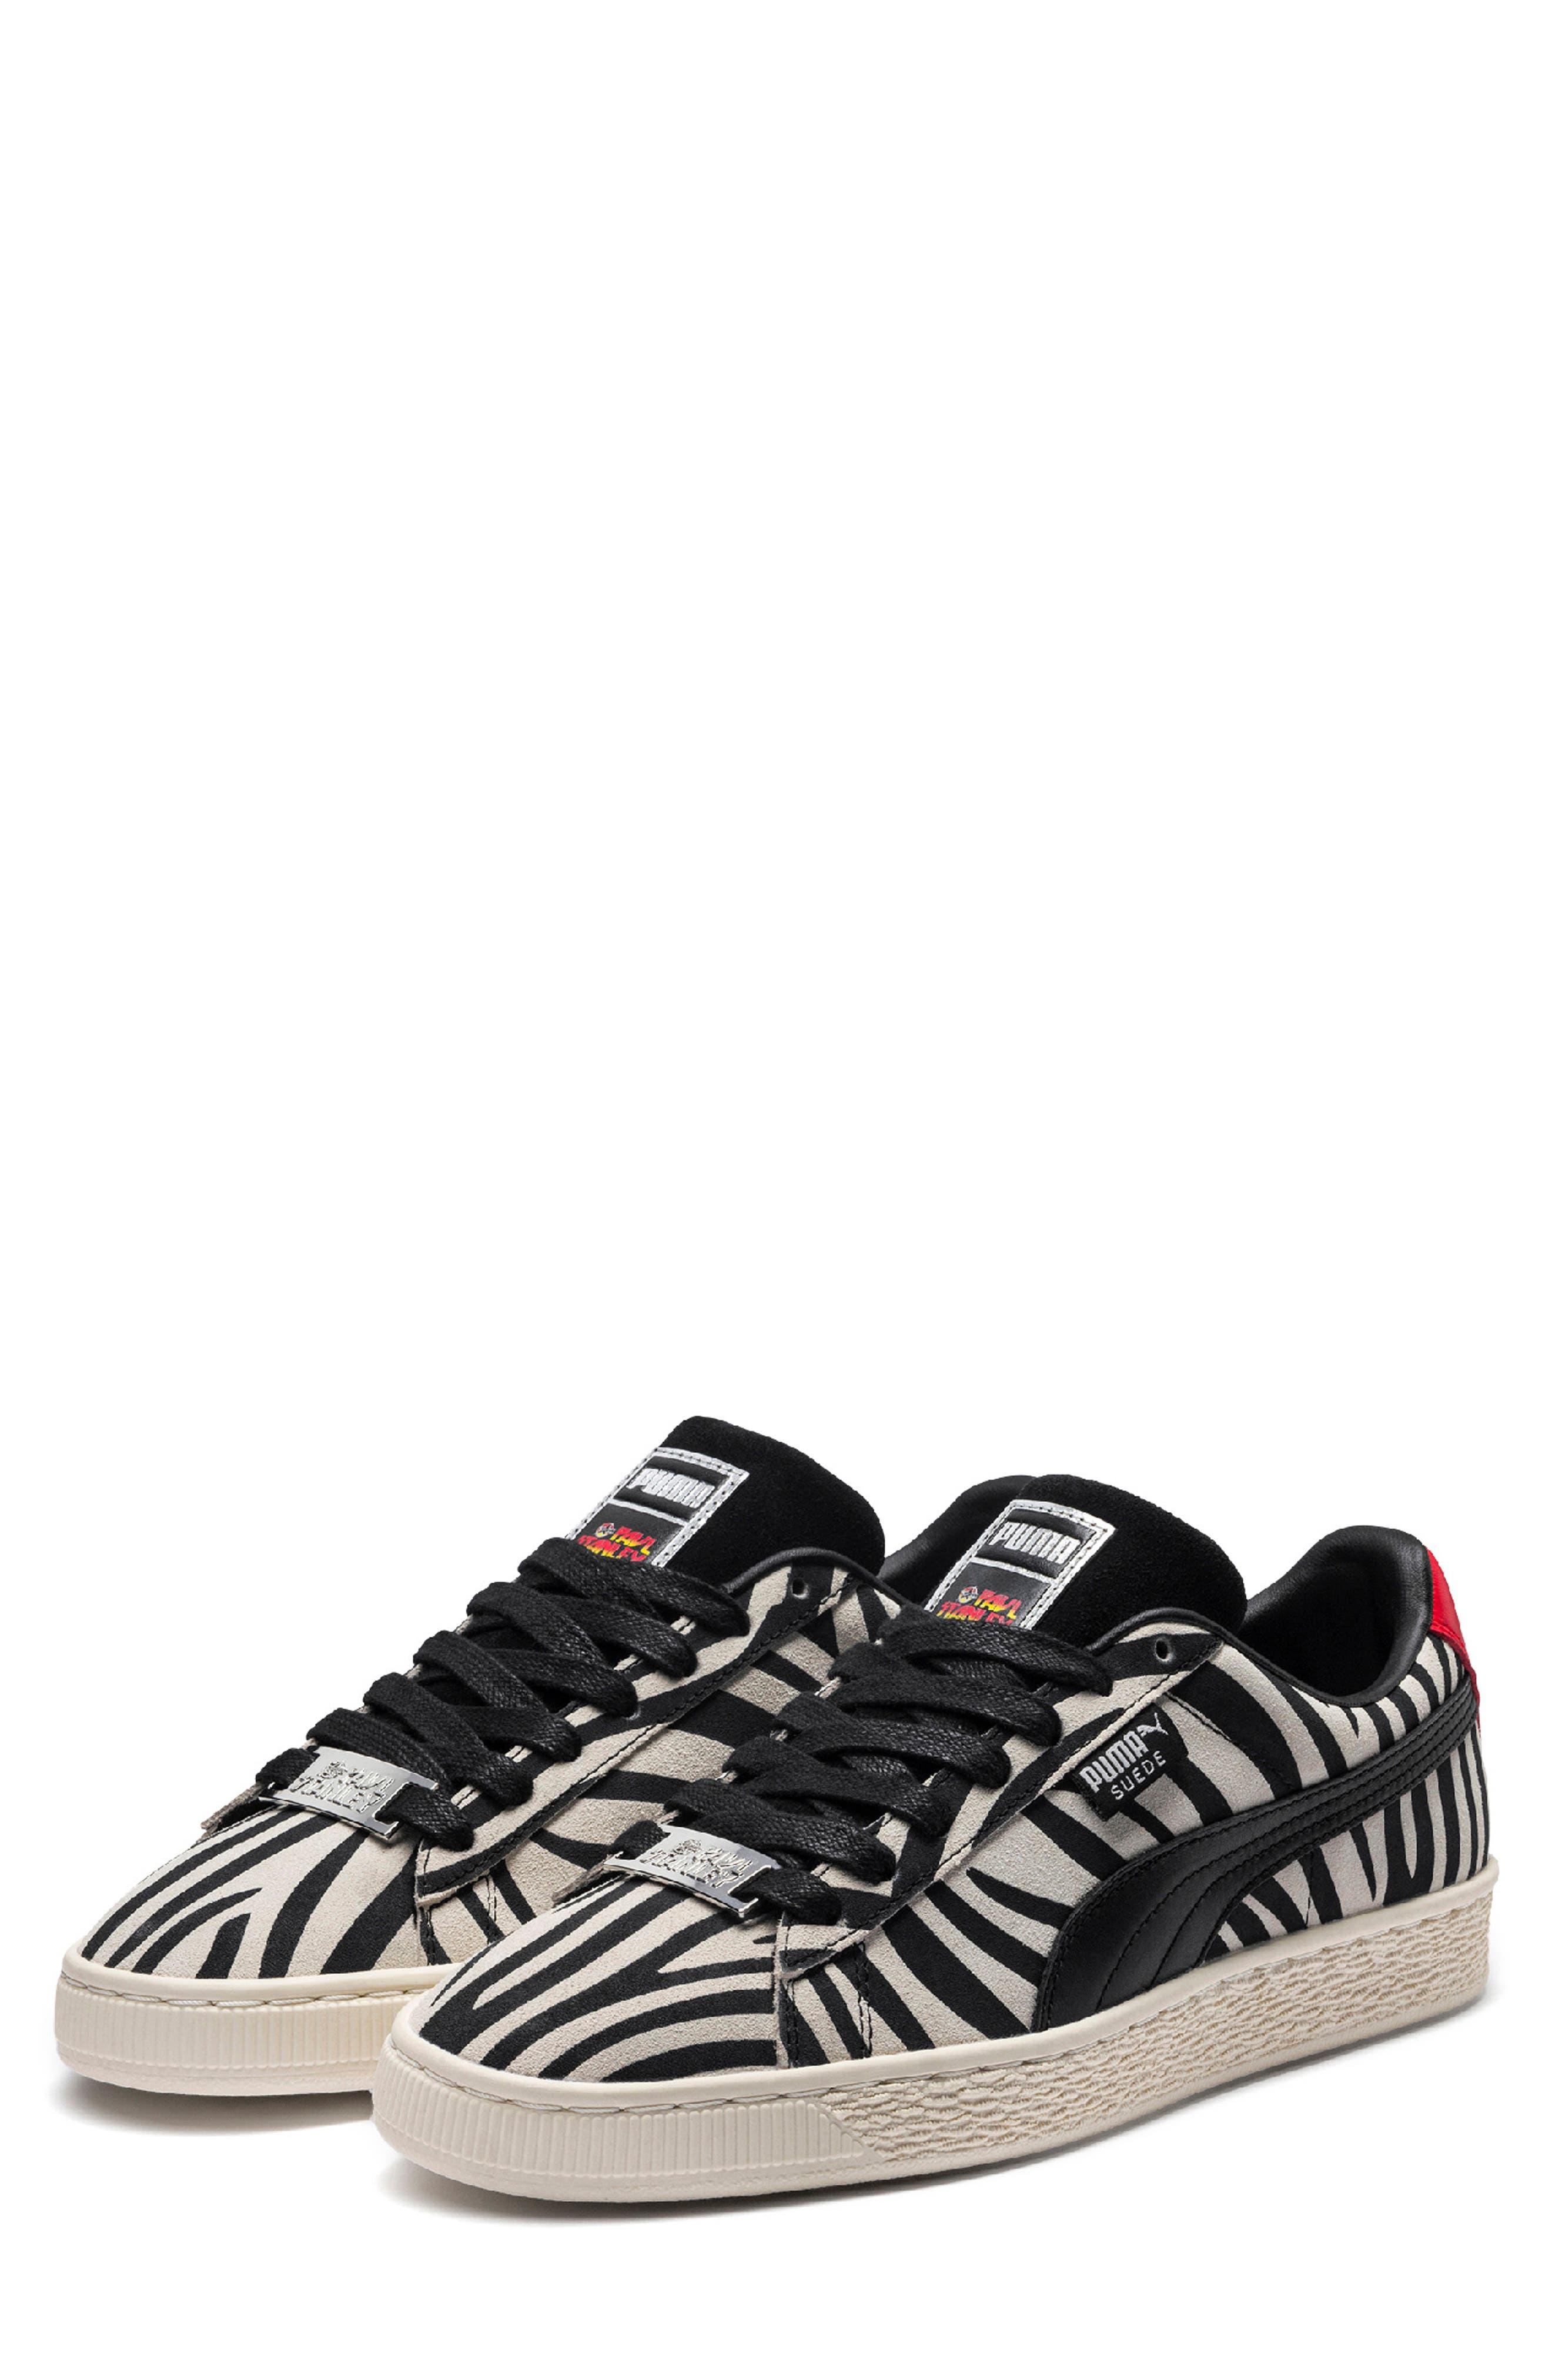 x Paul Stanley Suede Classic Sneaker, Main, color, 100